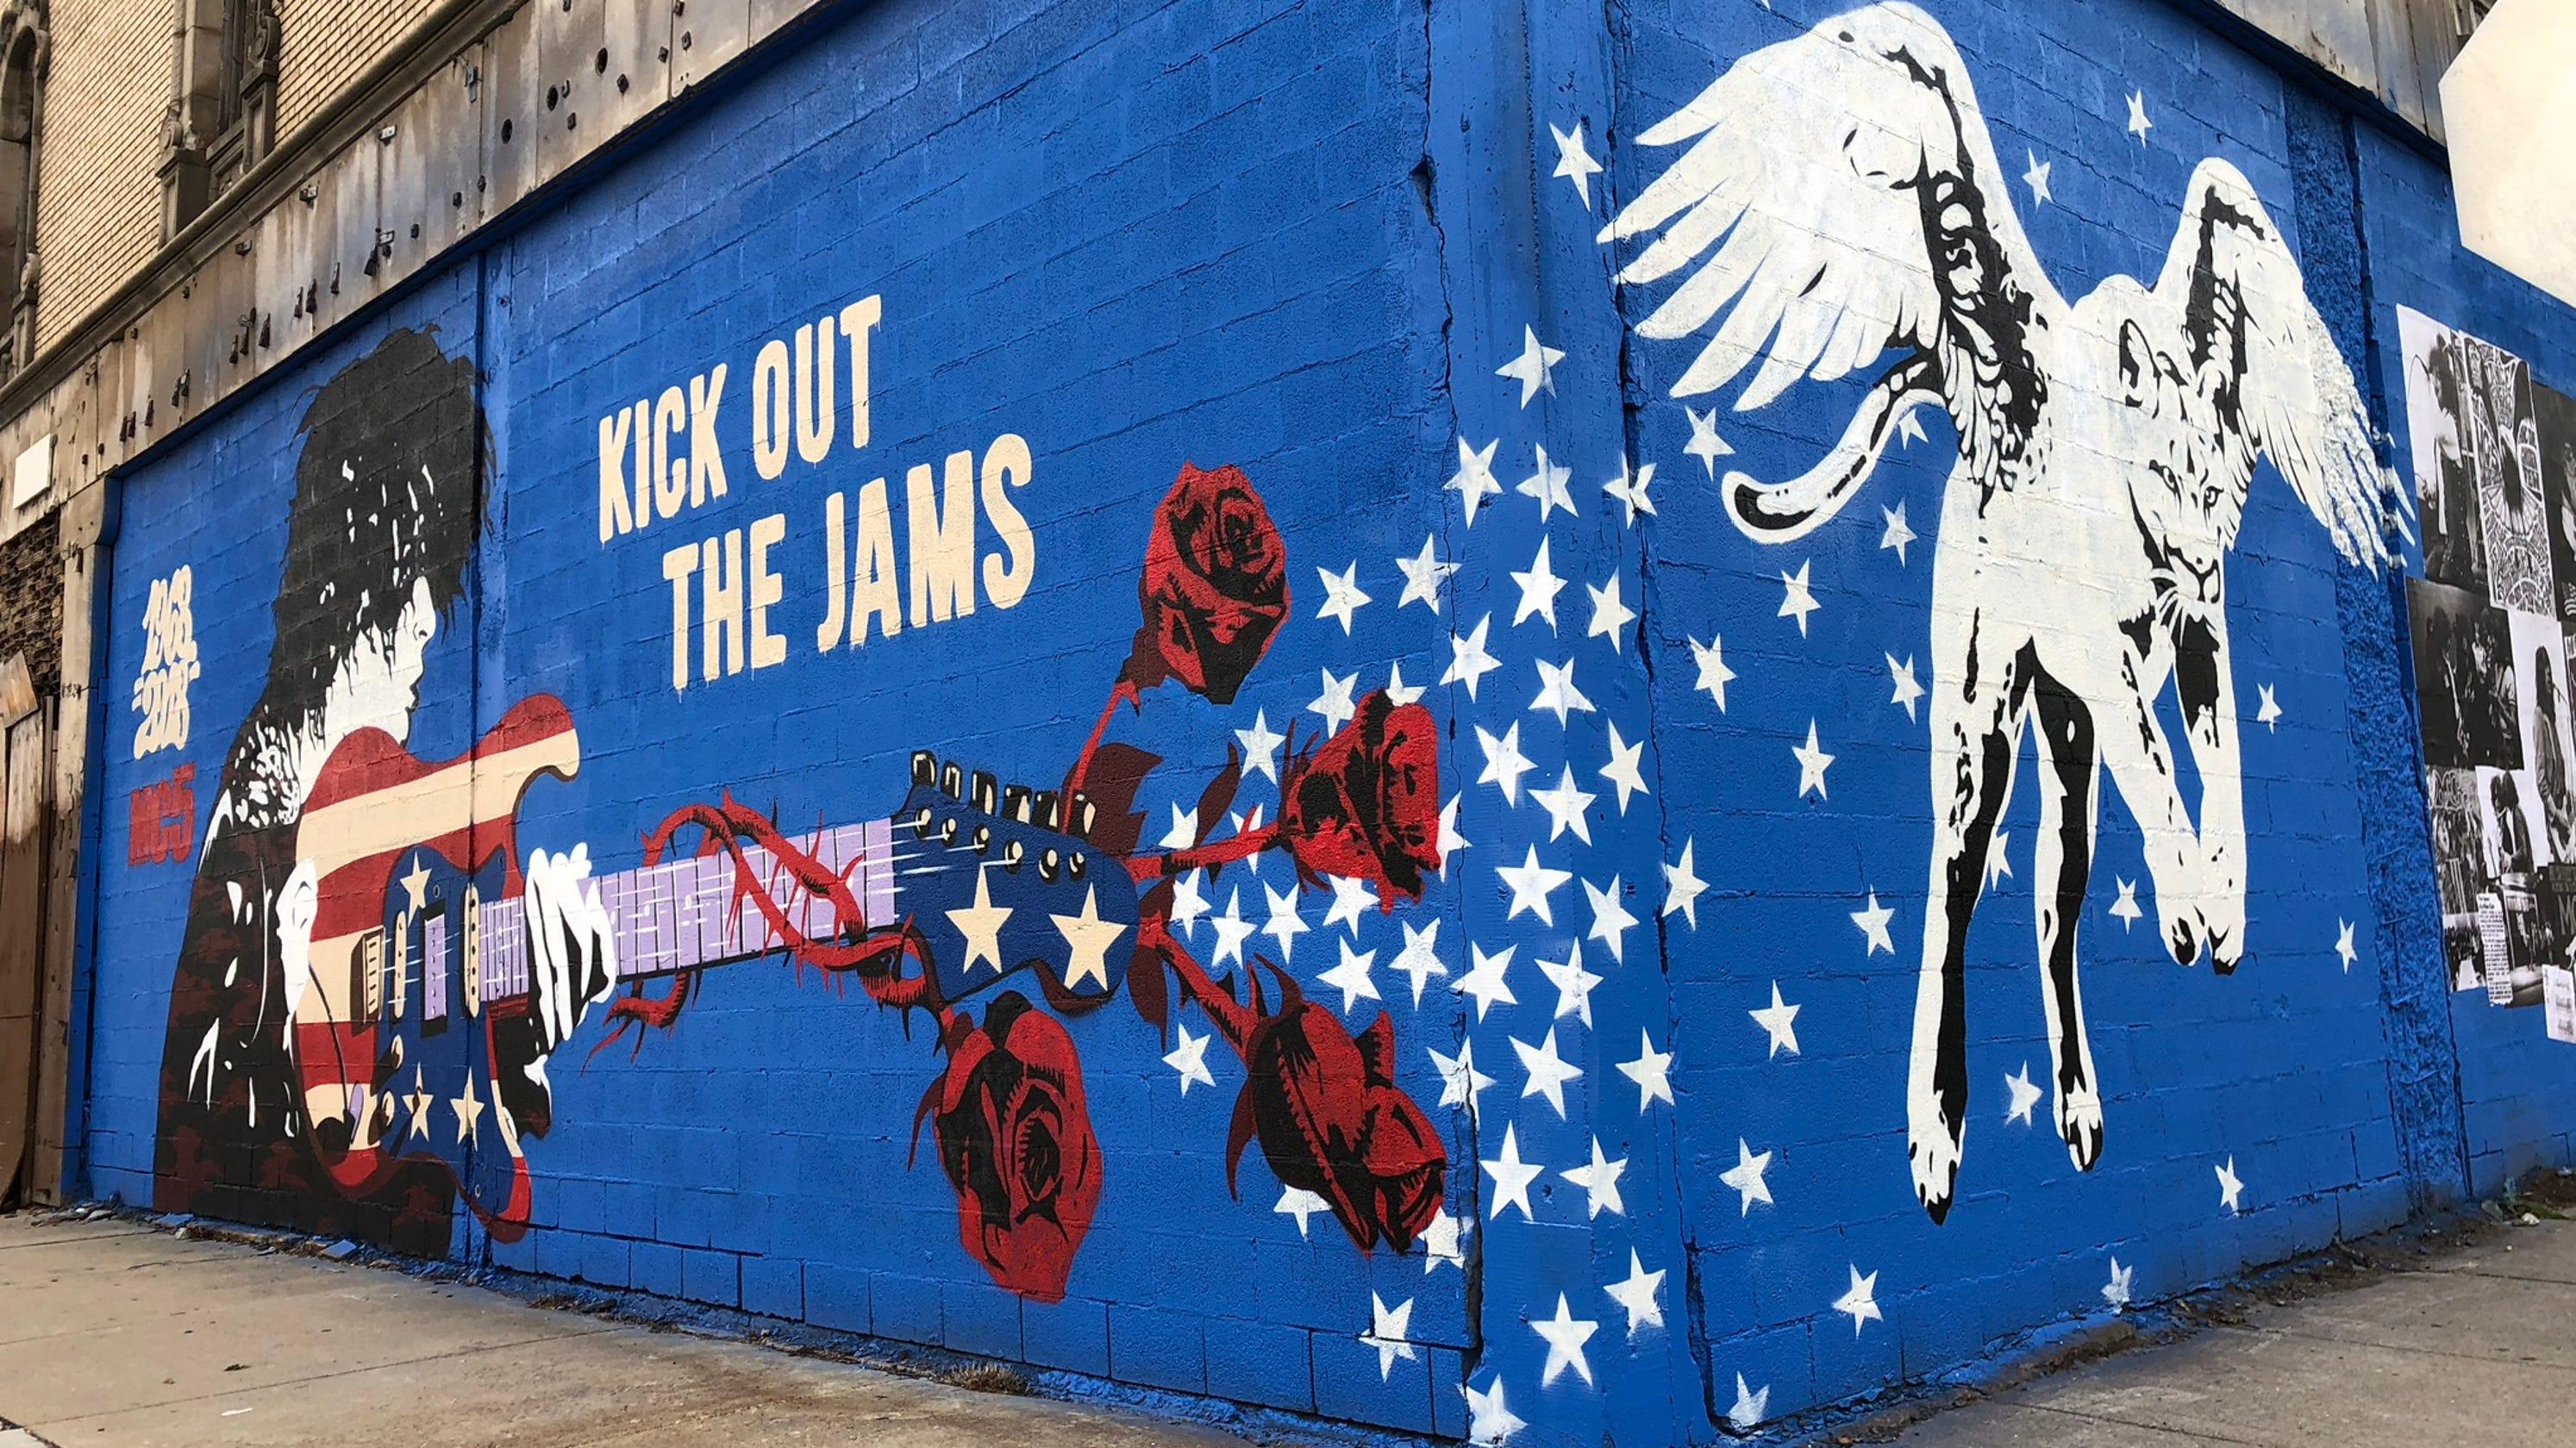 Detroit S Grande Ballroom Gets New Mural Commemorating Mc5